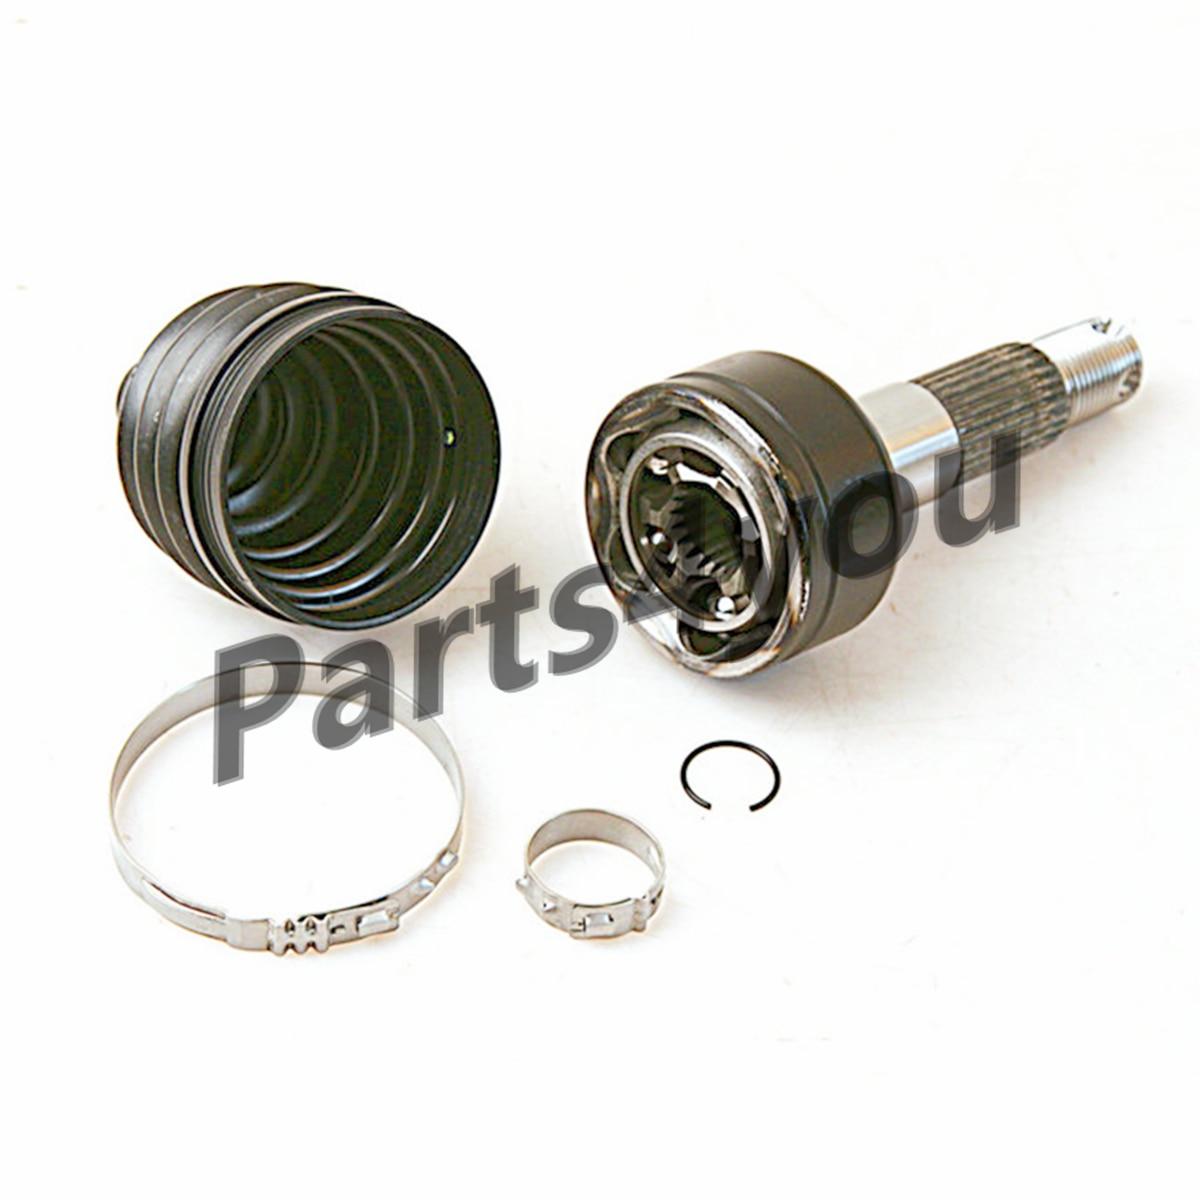 ODM Fixed End Bearing Kit for CFmoto CF400 CForce 400S 450 CF500 X5 500S 520 550 CF625 ZForce X6 CF800 X8 ATV SSV 9GQ0-280170 enlarge